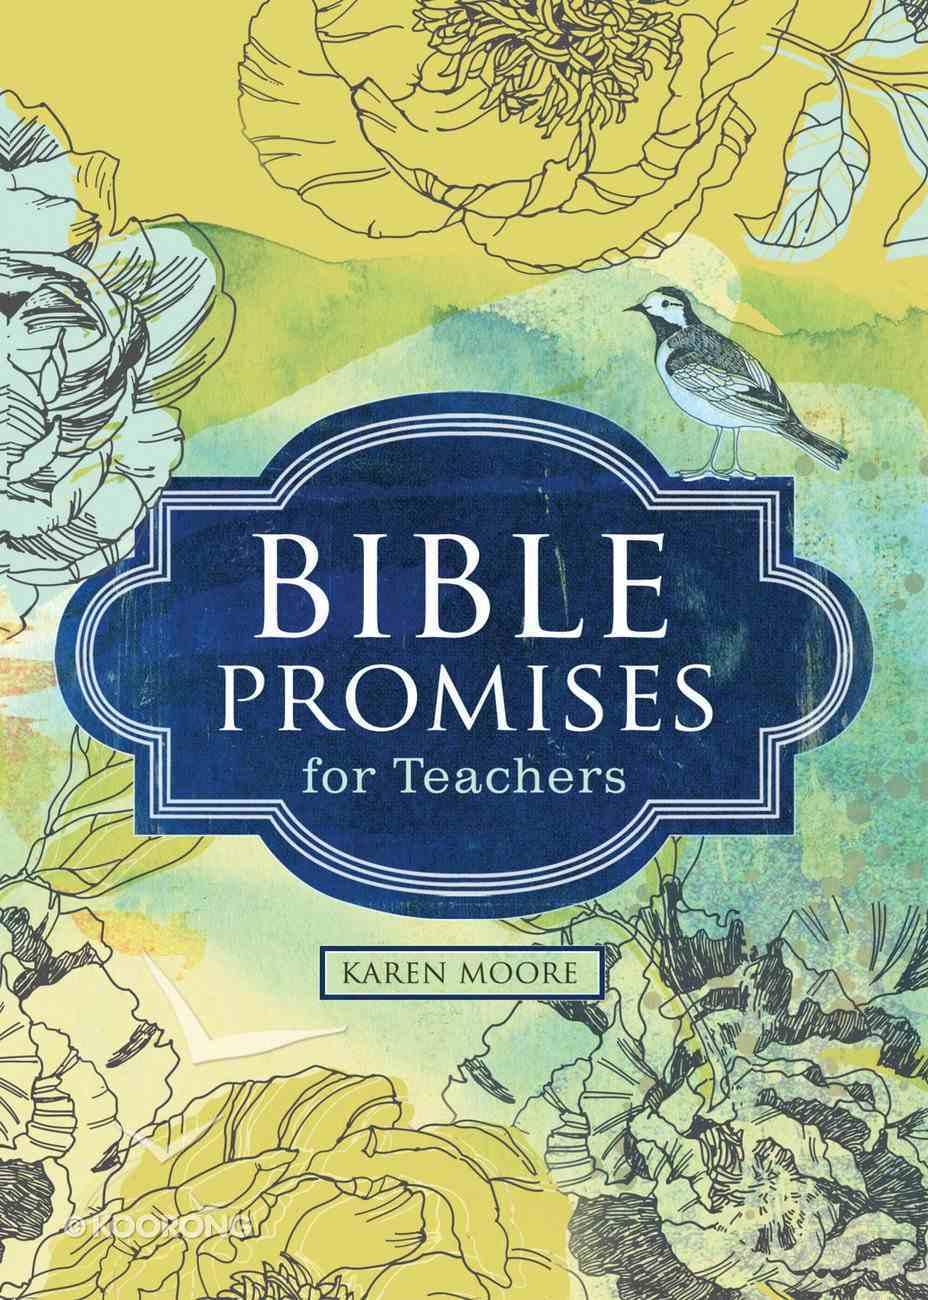 Bible Promises For Teachers (Hcsb) eBook